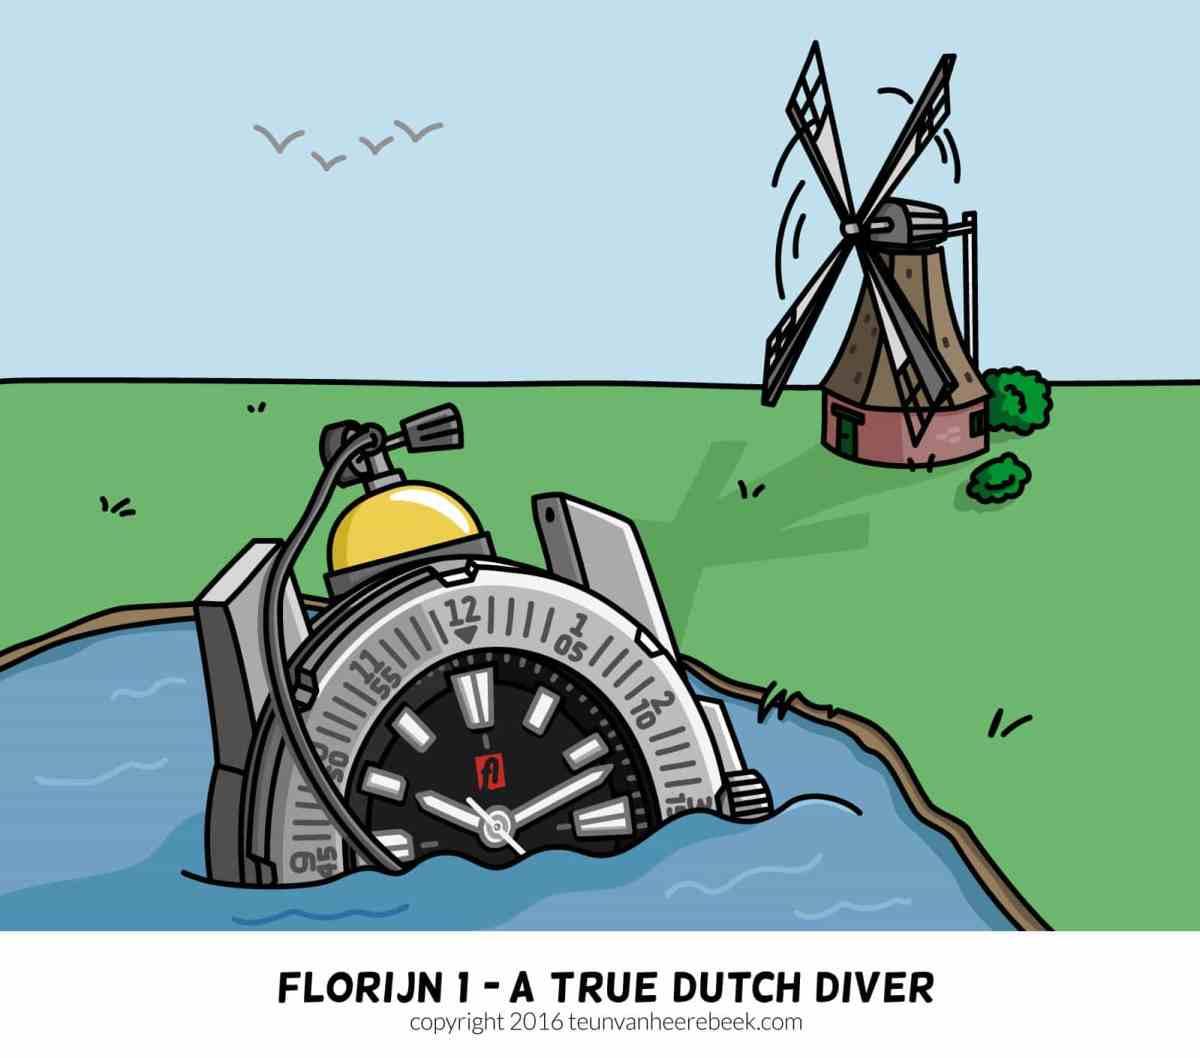 Dutch diver: Florijn 1